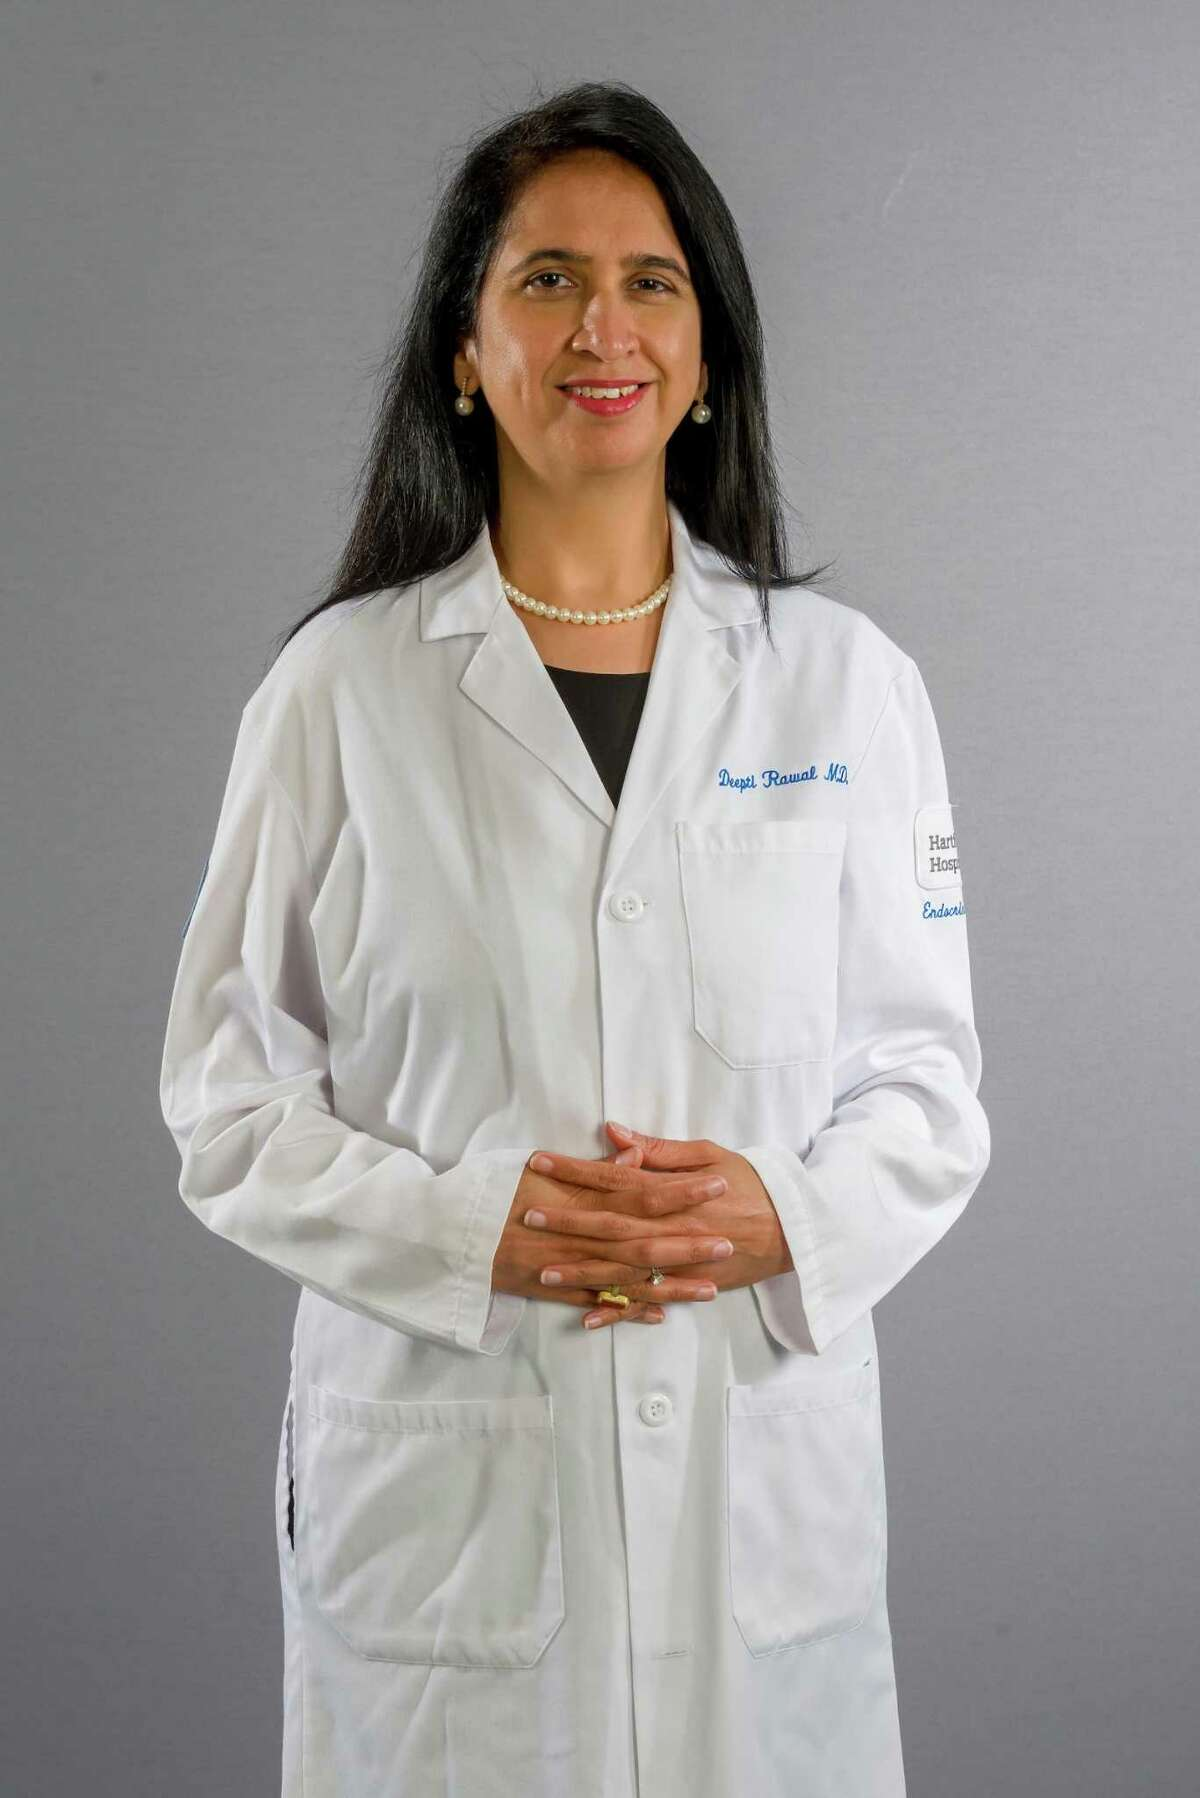 Aimee JetteDeepti Rawal, MD